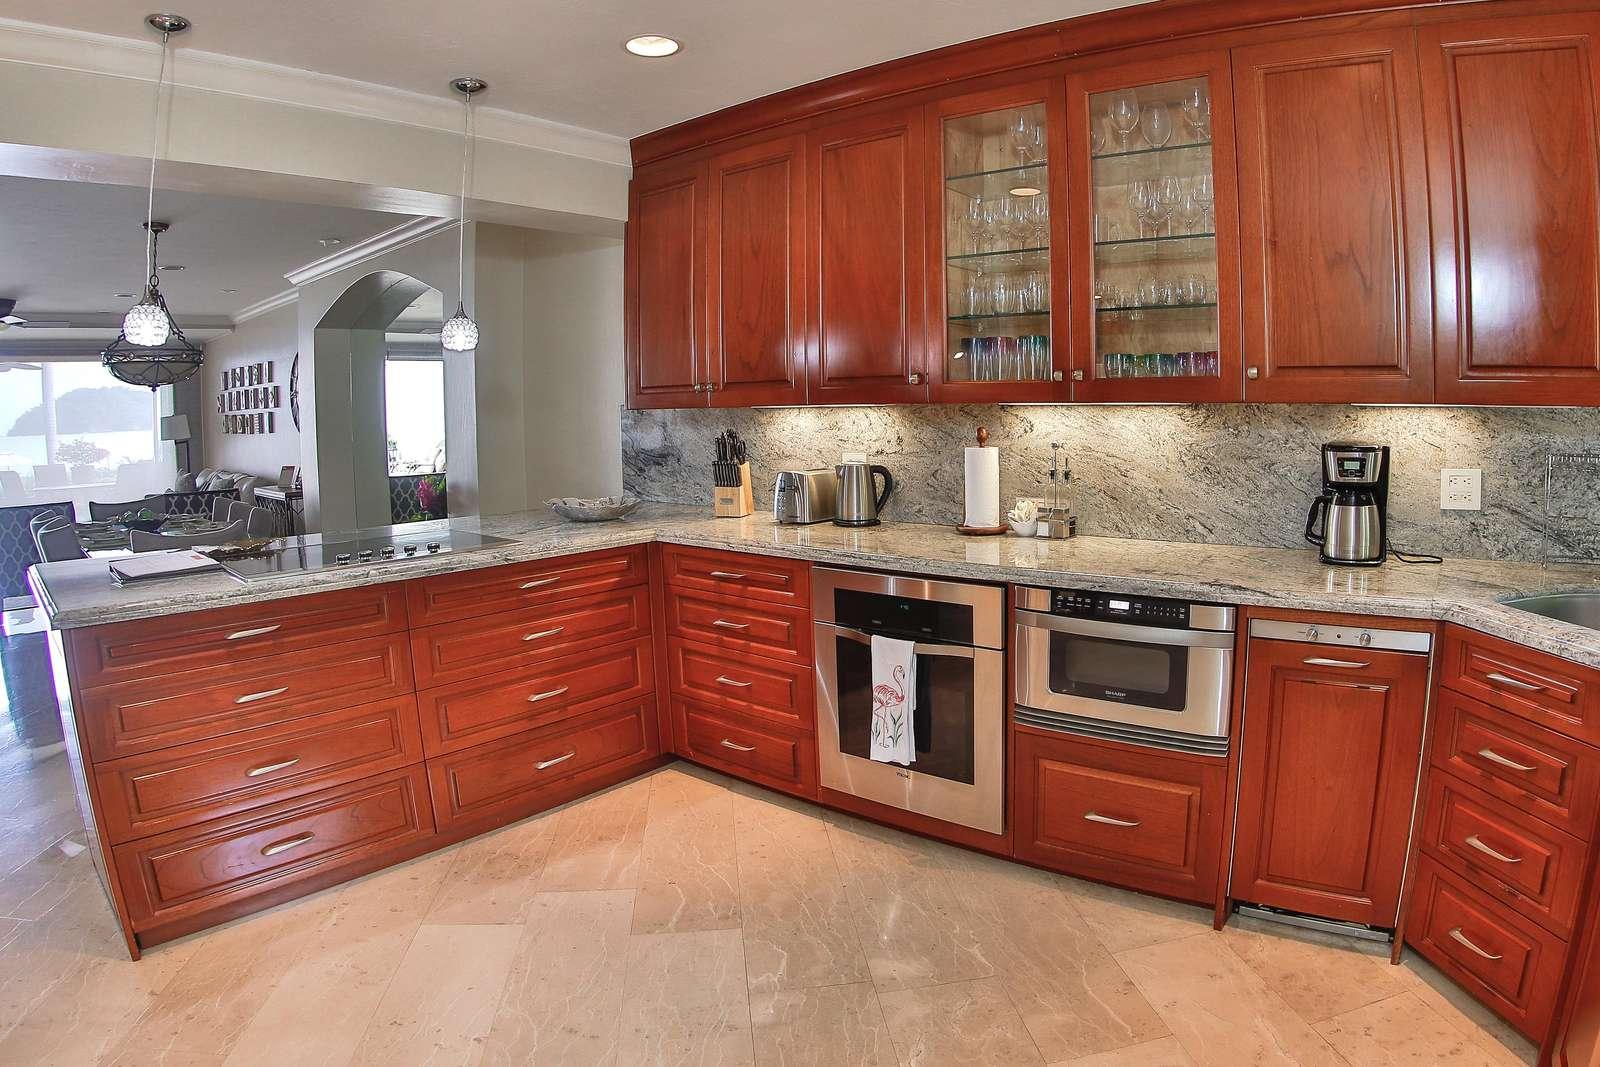 Gourmet kitchen, fully stocked